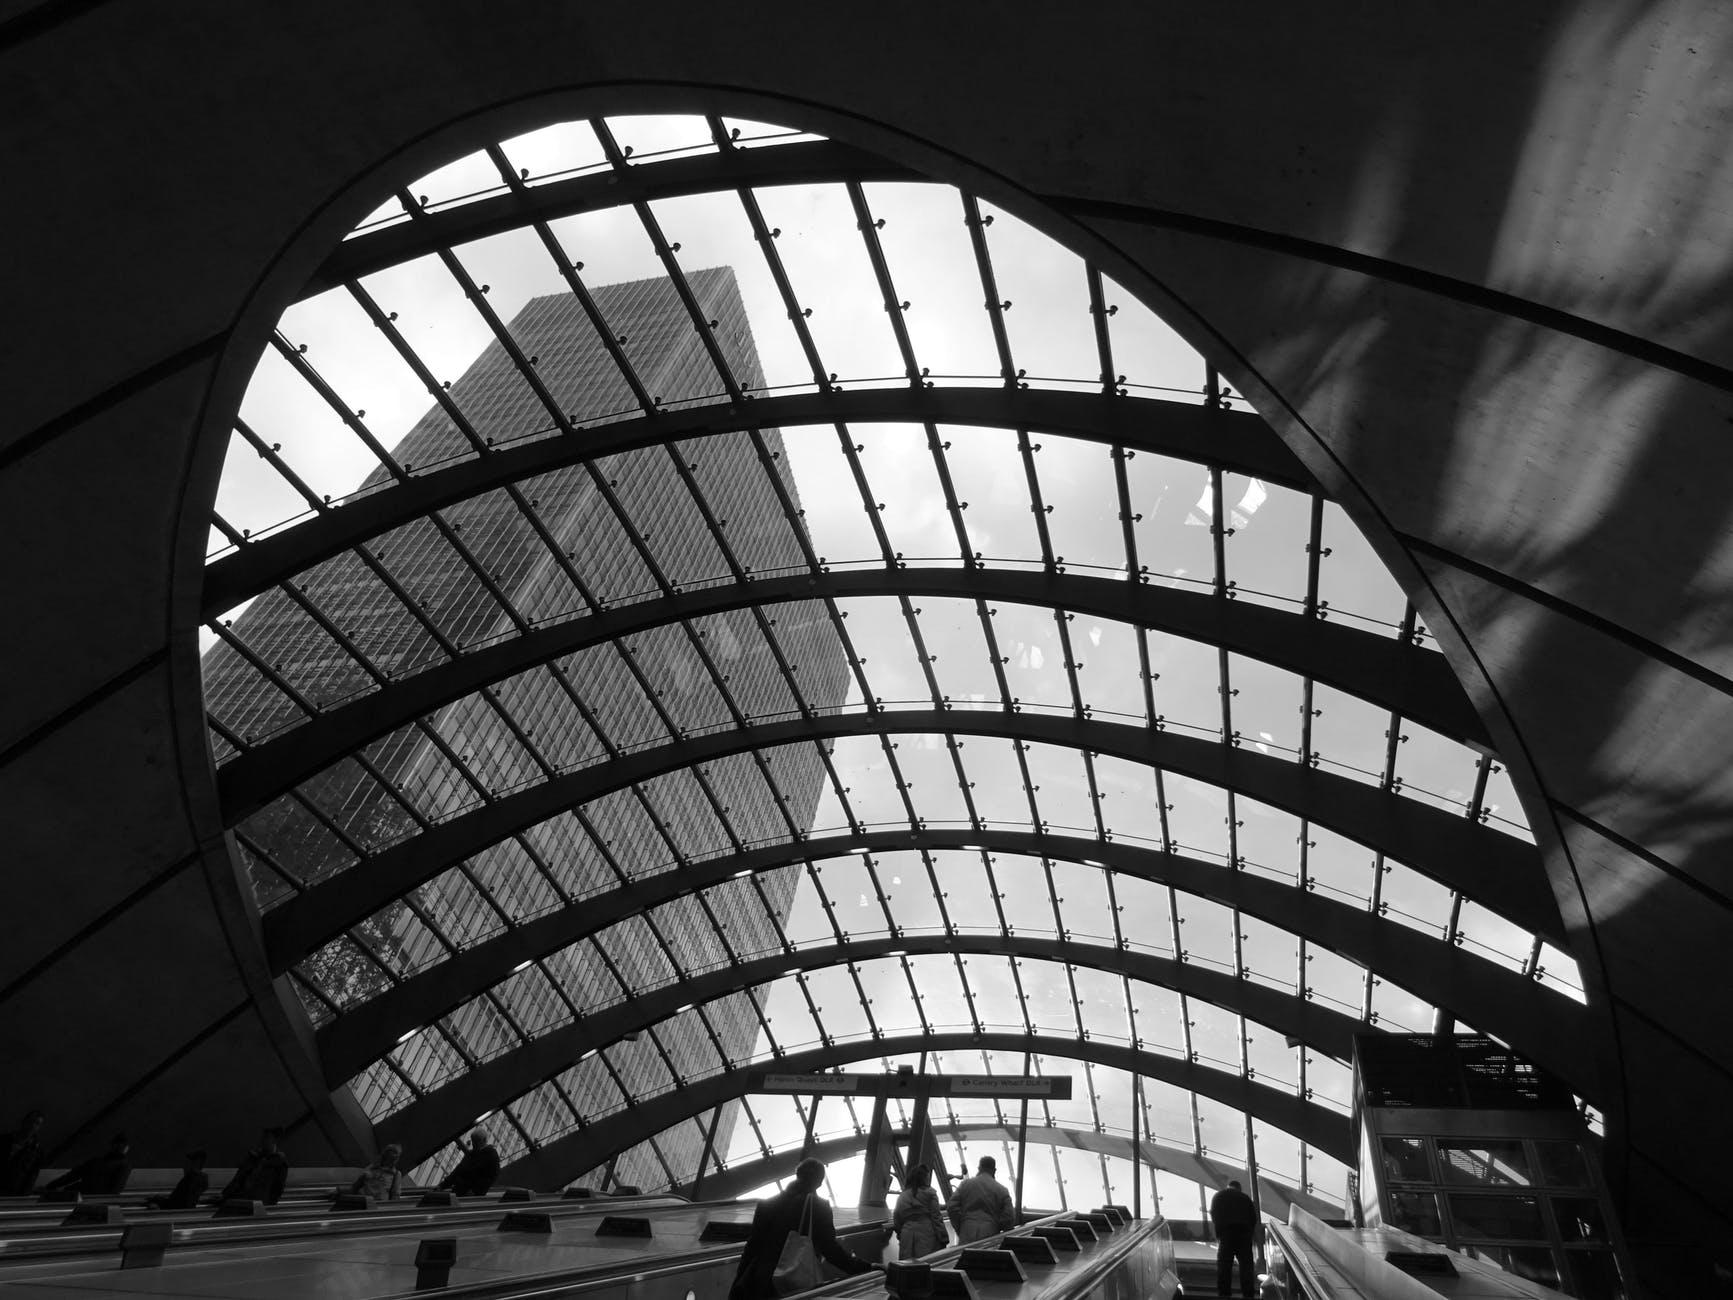 architecture building business ceiling